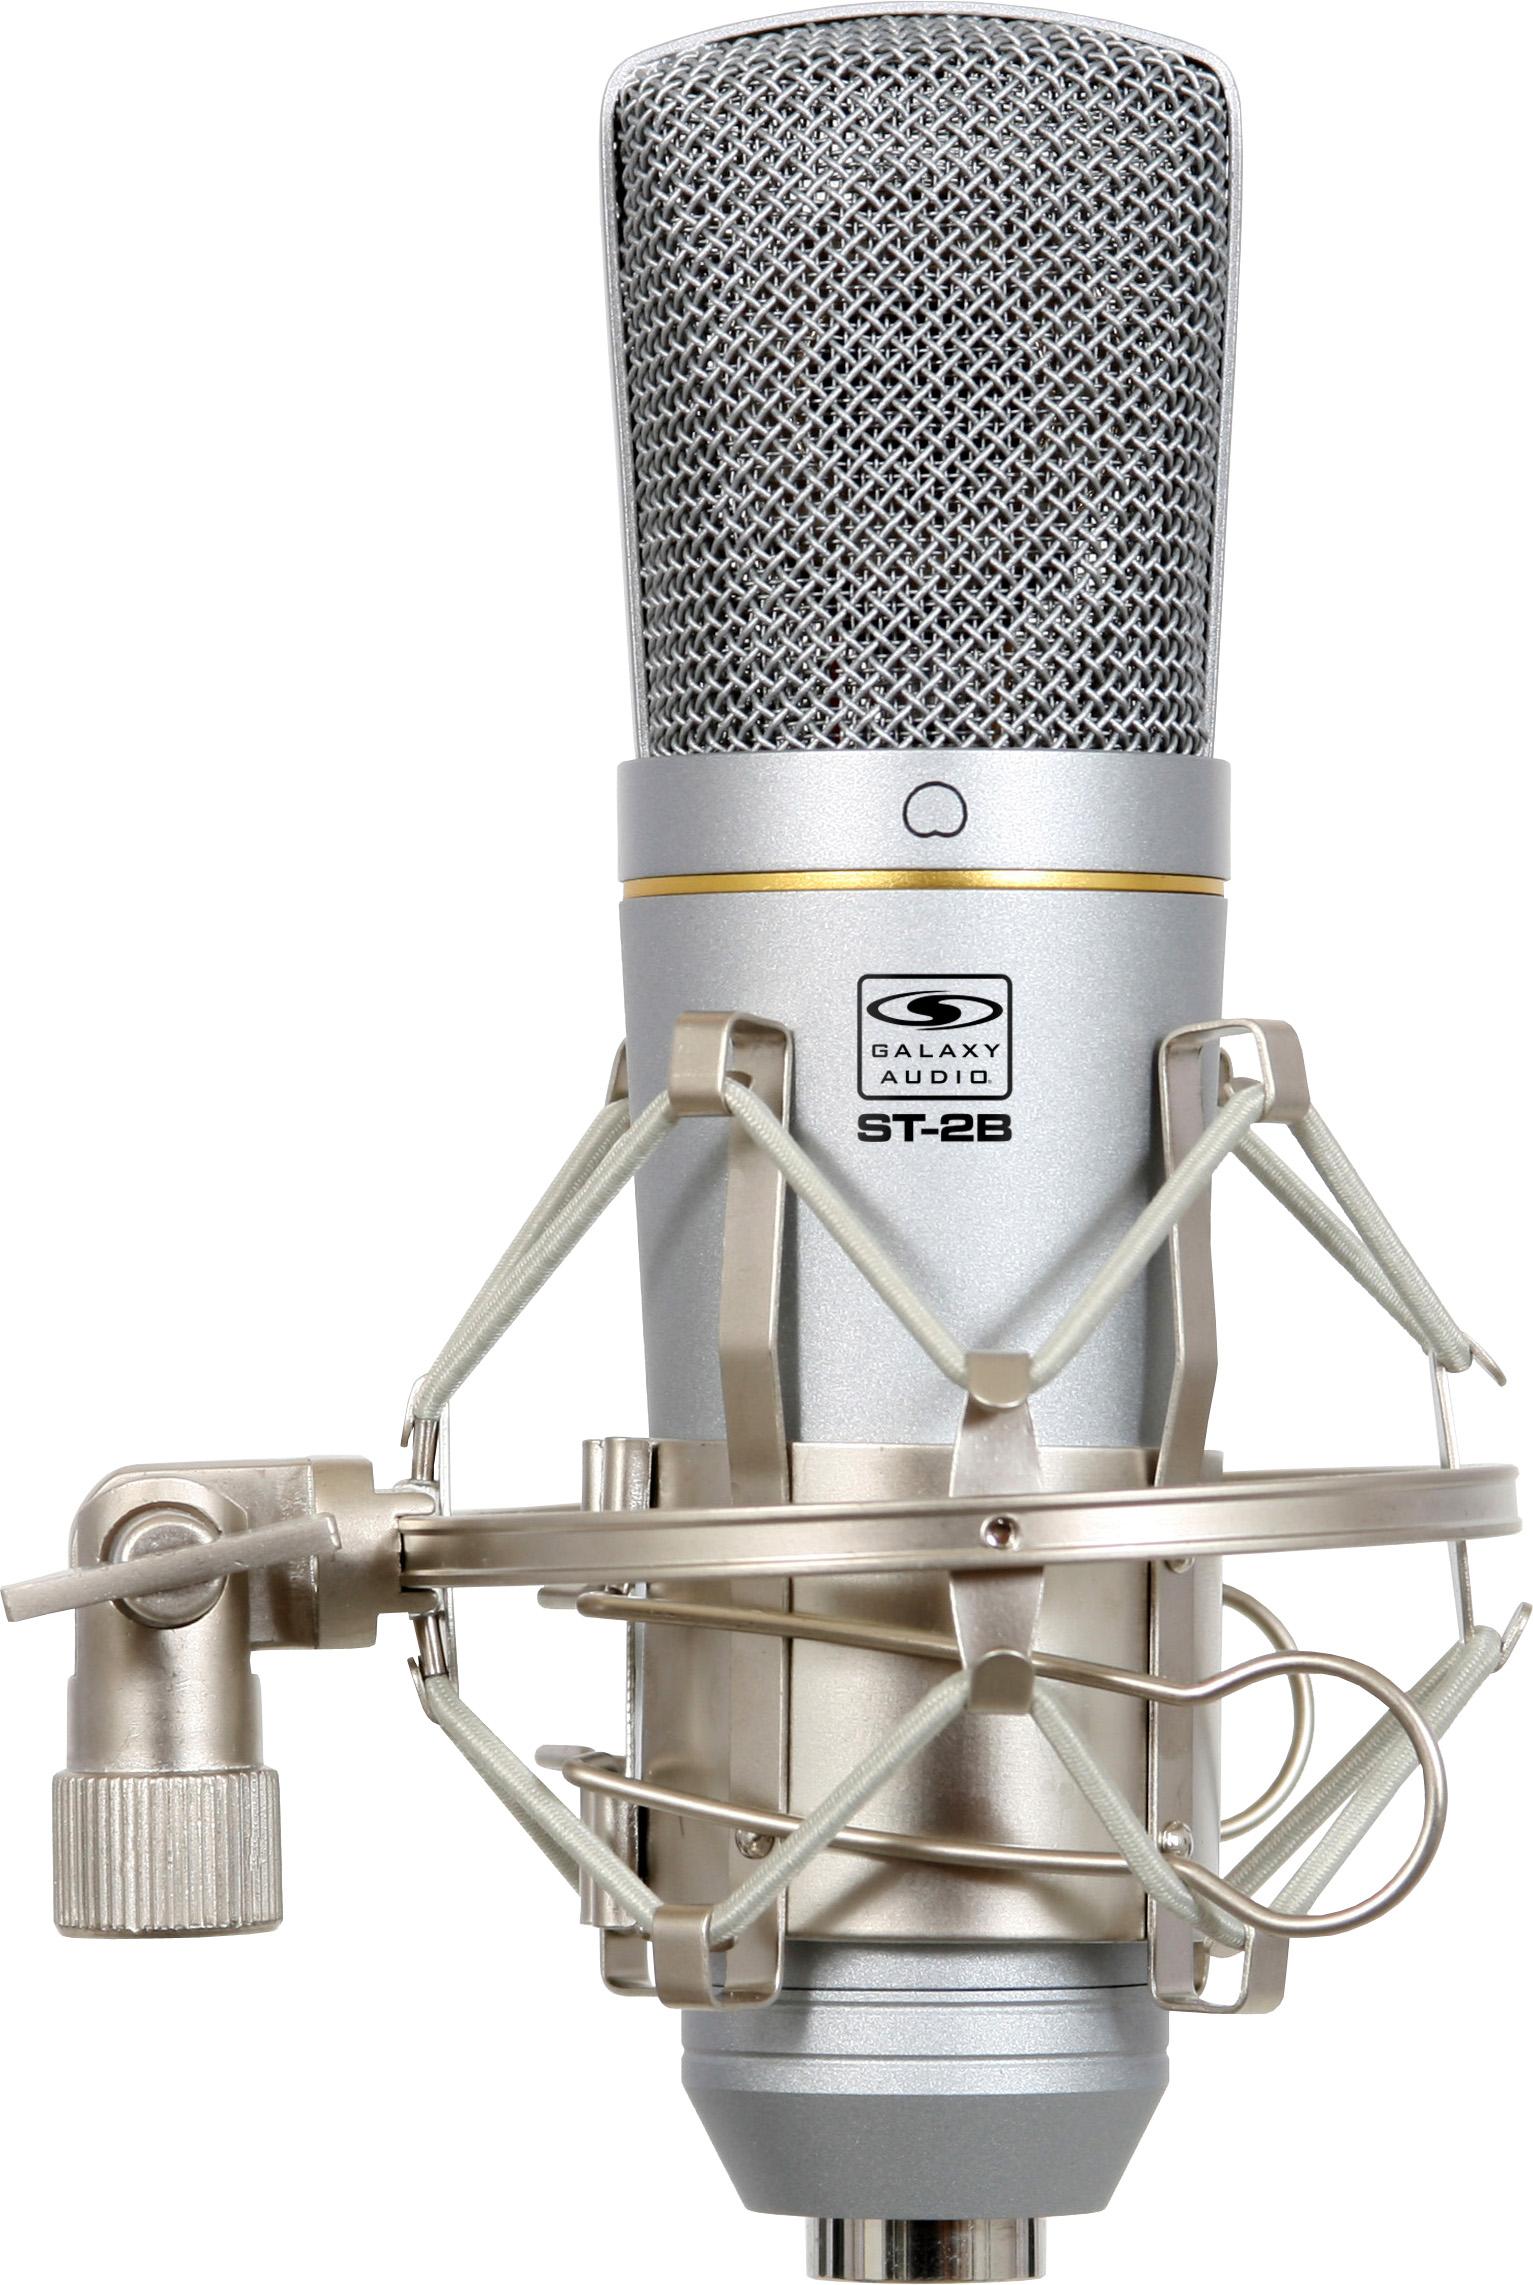 galaxy audio st 2b usb condenser microphone. Black Bedroom Furniture Sets. Home Design Ideas